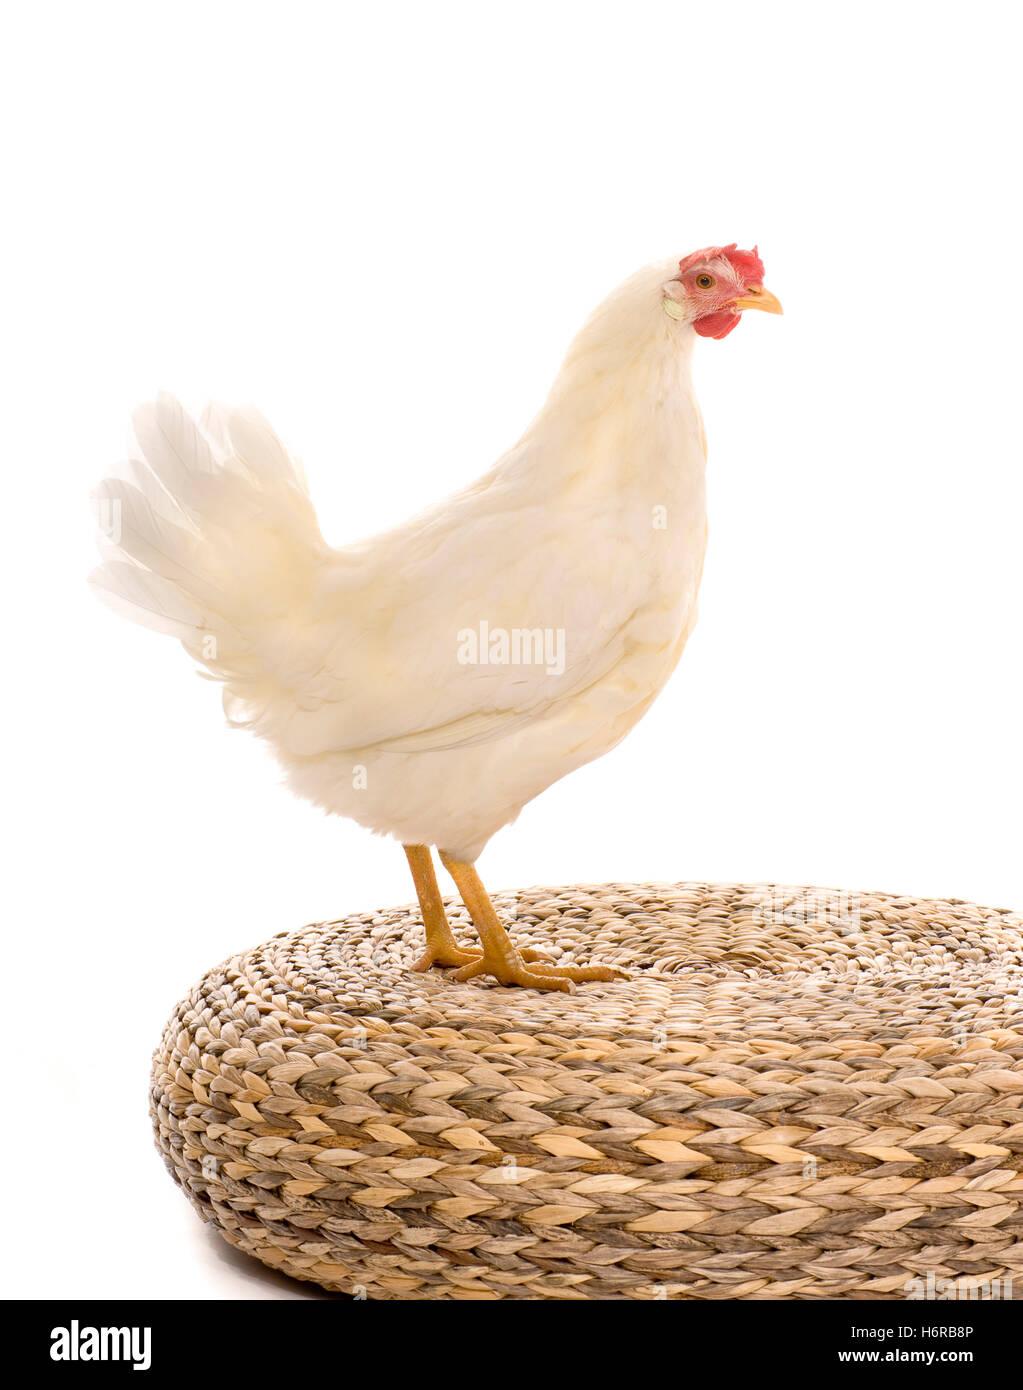 bird agriculture farming livestock farm poultry chicken animal bird agriculture farming wing livestock farm poultry - Stock Image